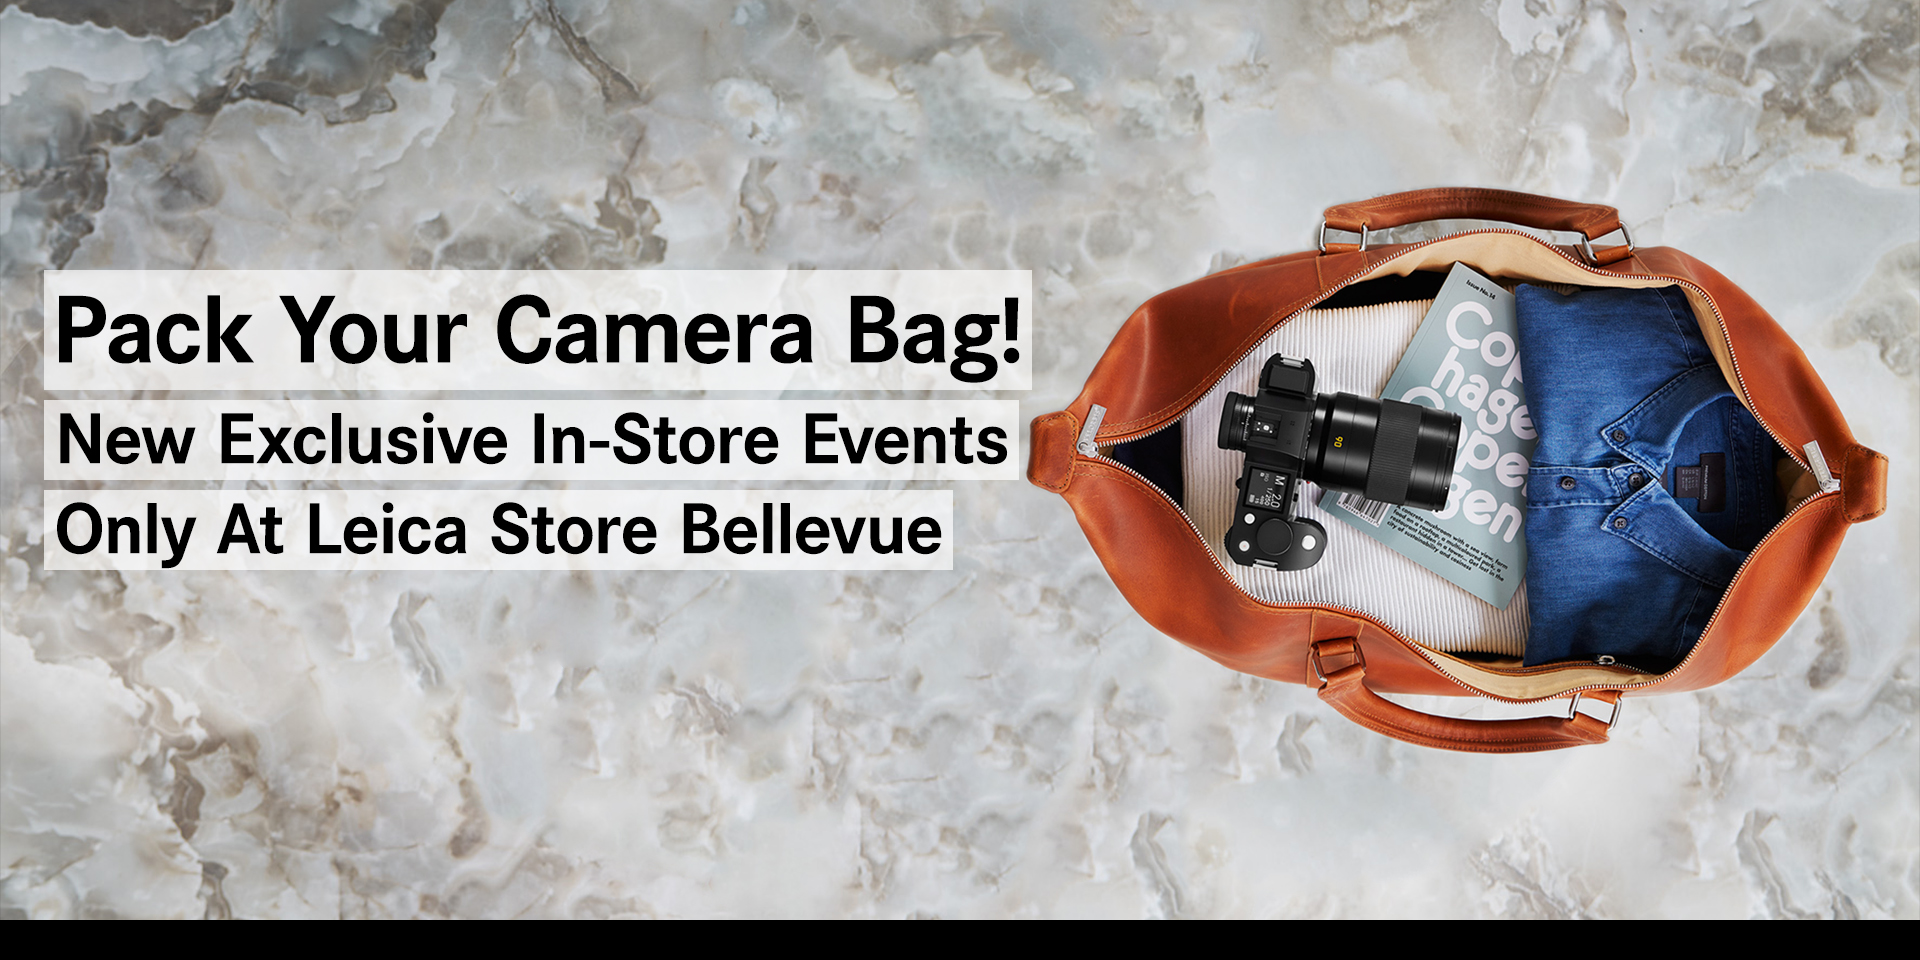 Leica Store Bellevue - Leica Store Bellevue